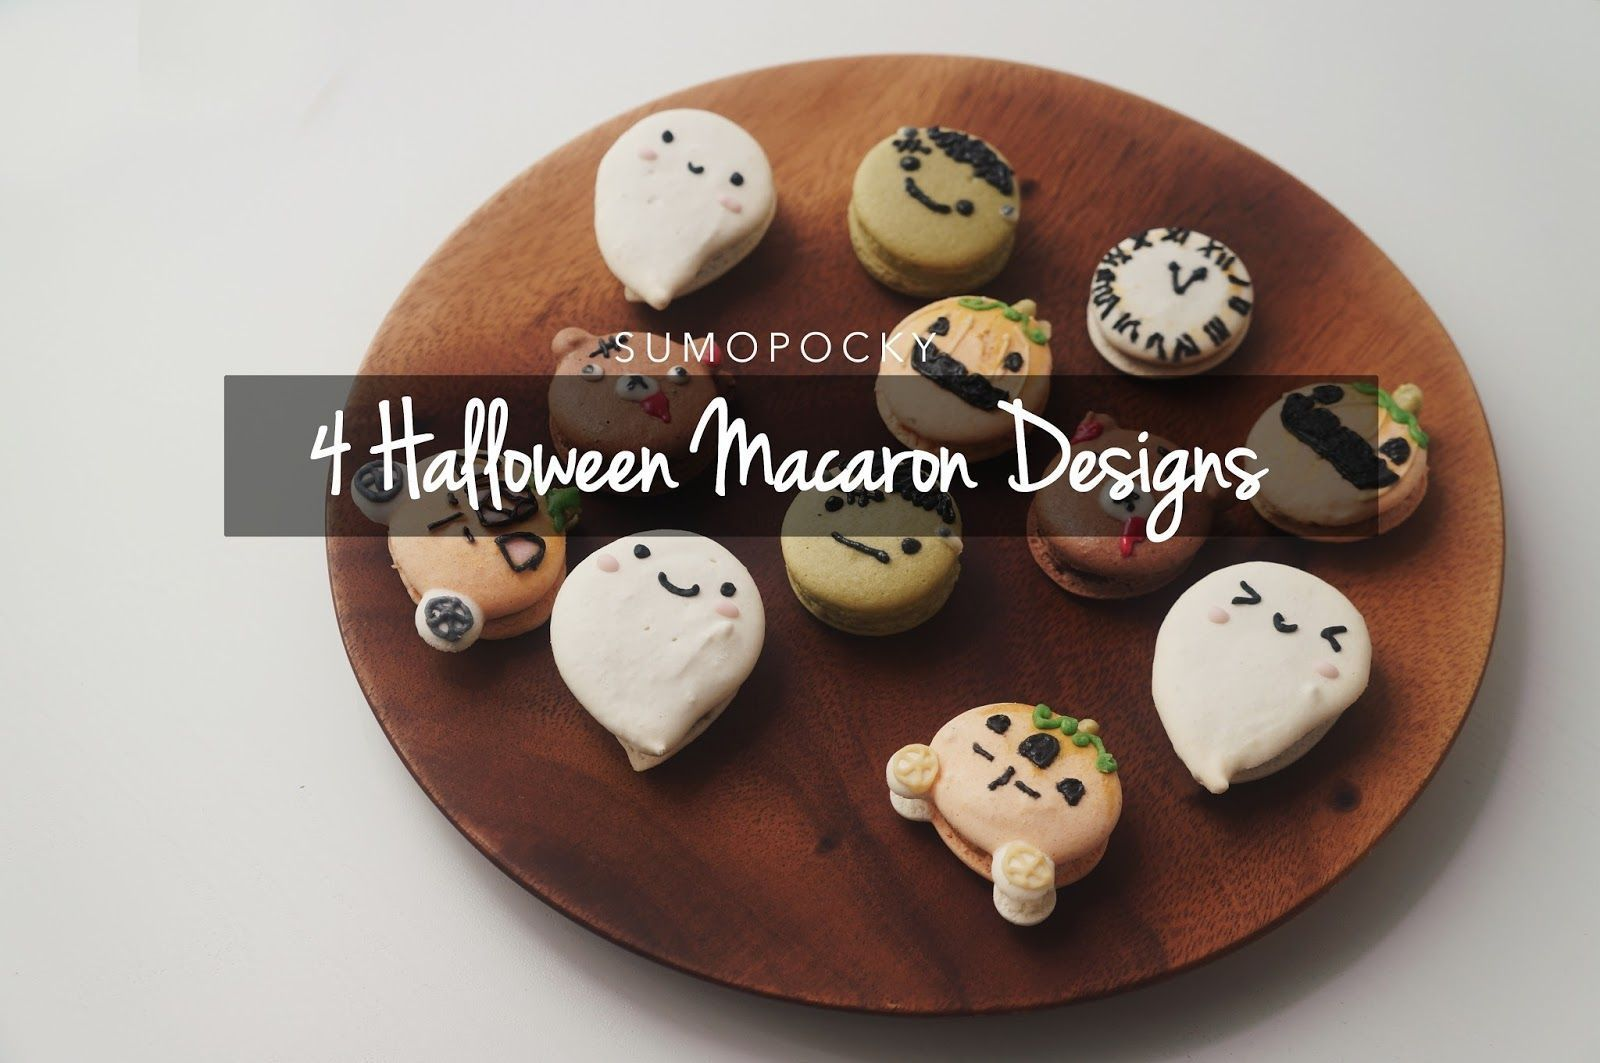 4 Cute Halloween Macaron Designs #halloweenmacarons 4 CUTE HALLOWEEN MACARON DESIGNS #halloweenmacarons 4 Cute Halloween Macaron Designs #halloweenmacarons 4 CUTE HALLOWEEN MACARON DESIGNS